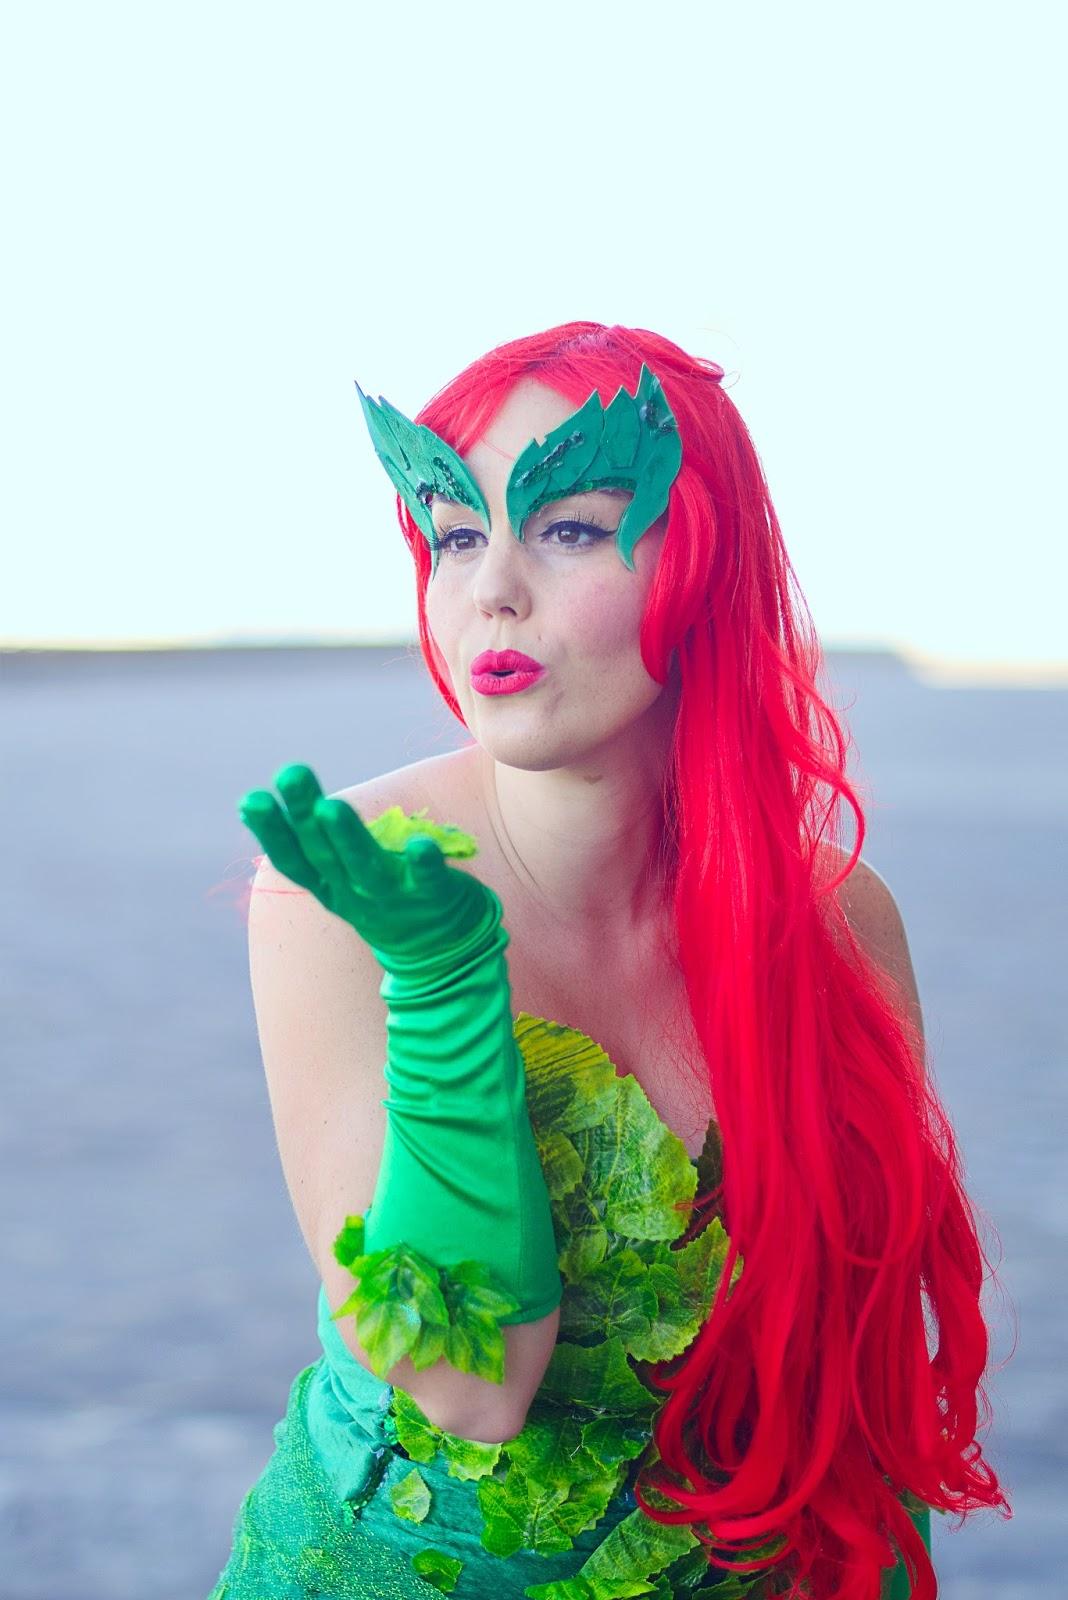 nery hdez, poison ivy , hiedra venenosa, carnaval, halloween , disfraz, costume